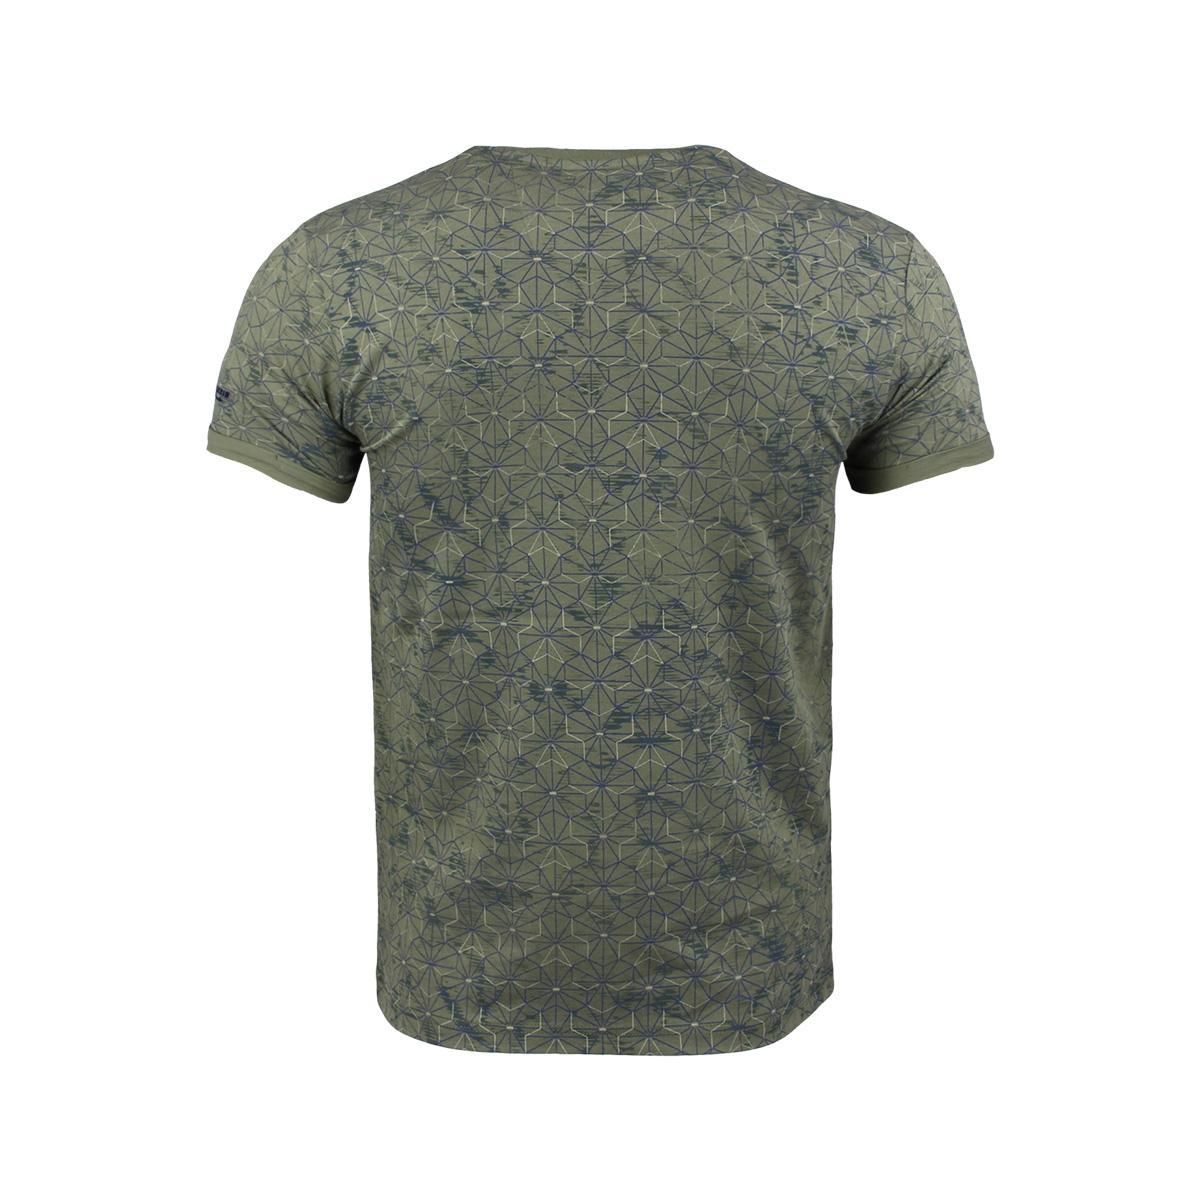 t shirt 15173 gabbiano t-shirt olive